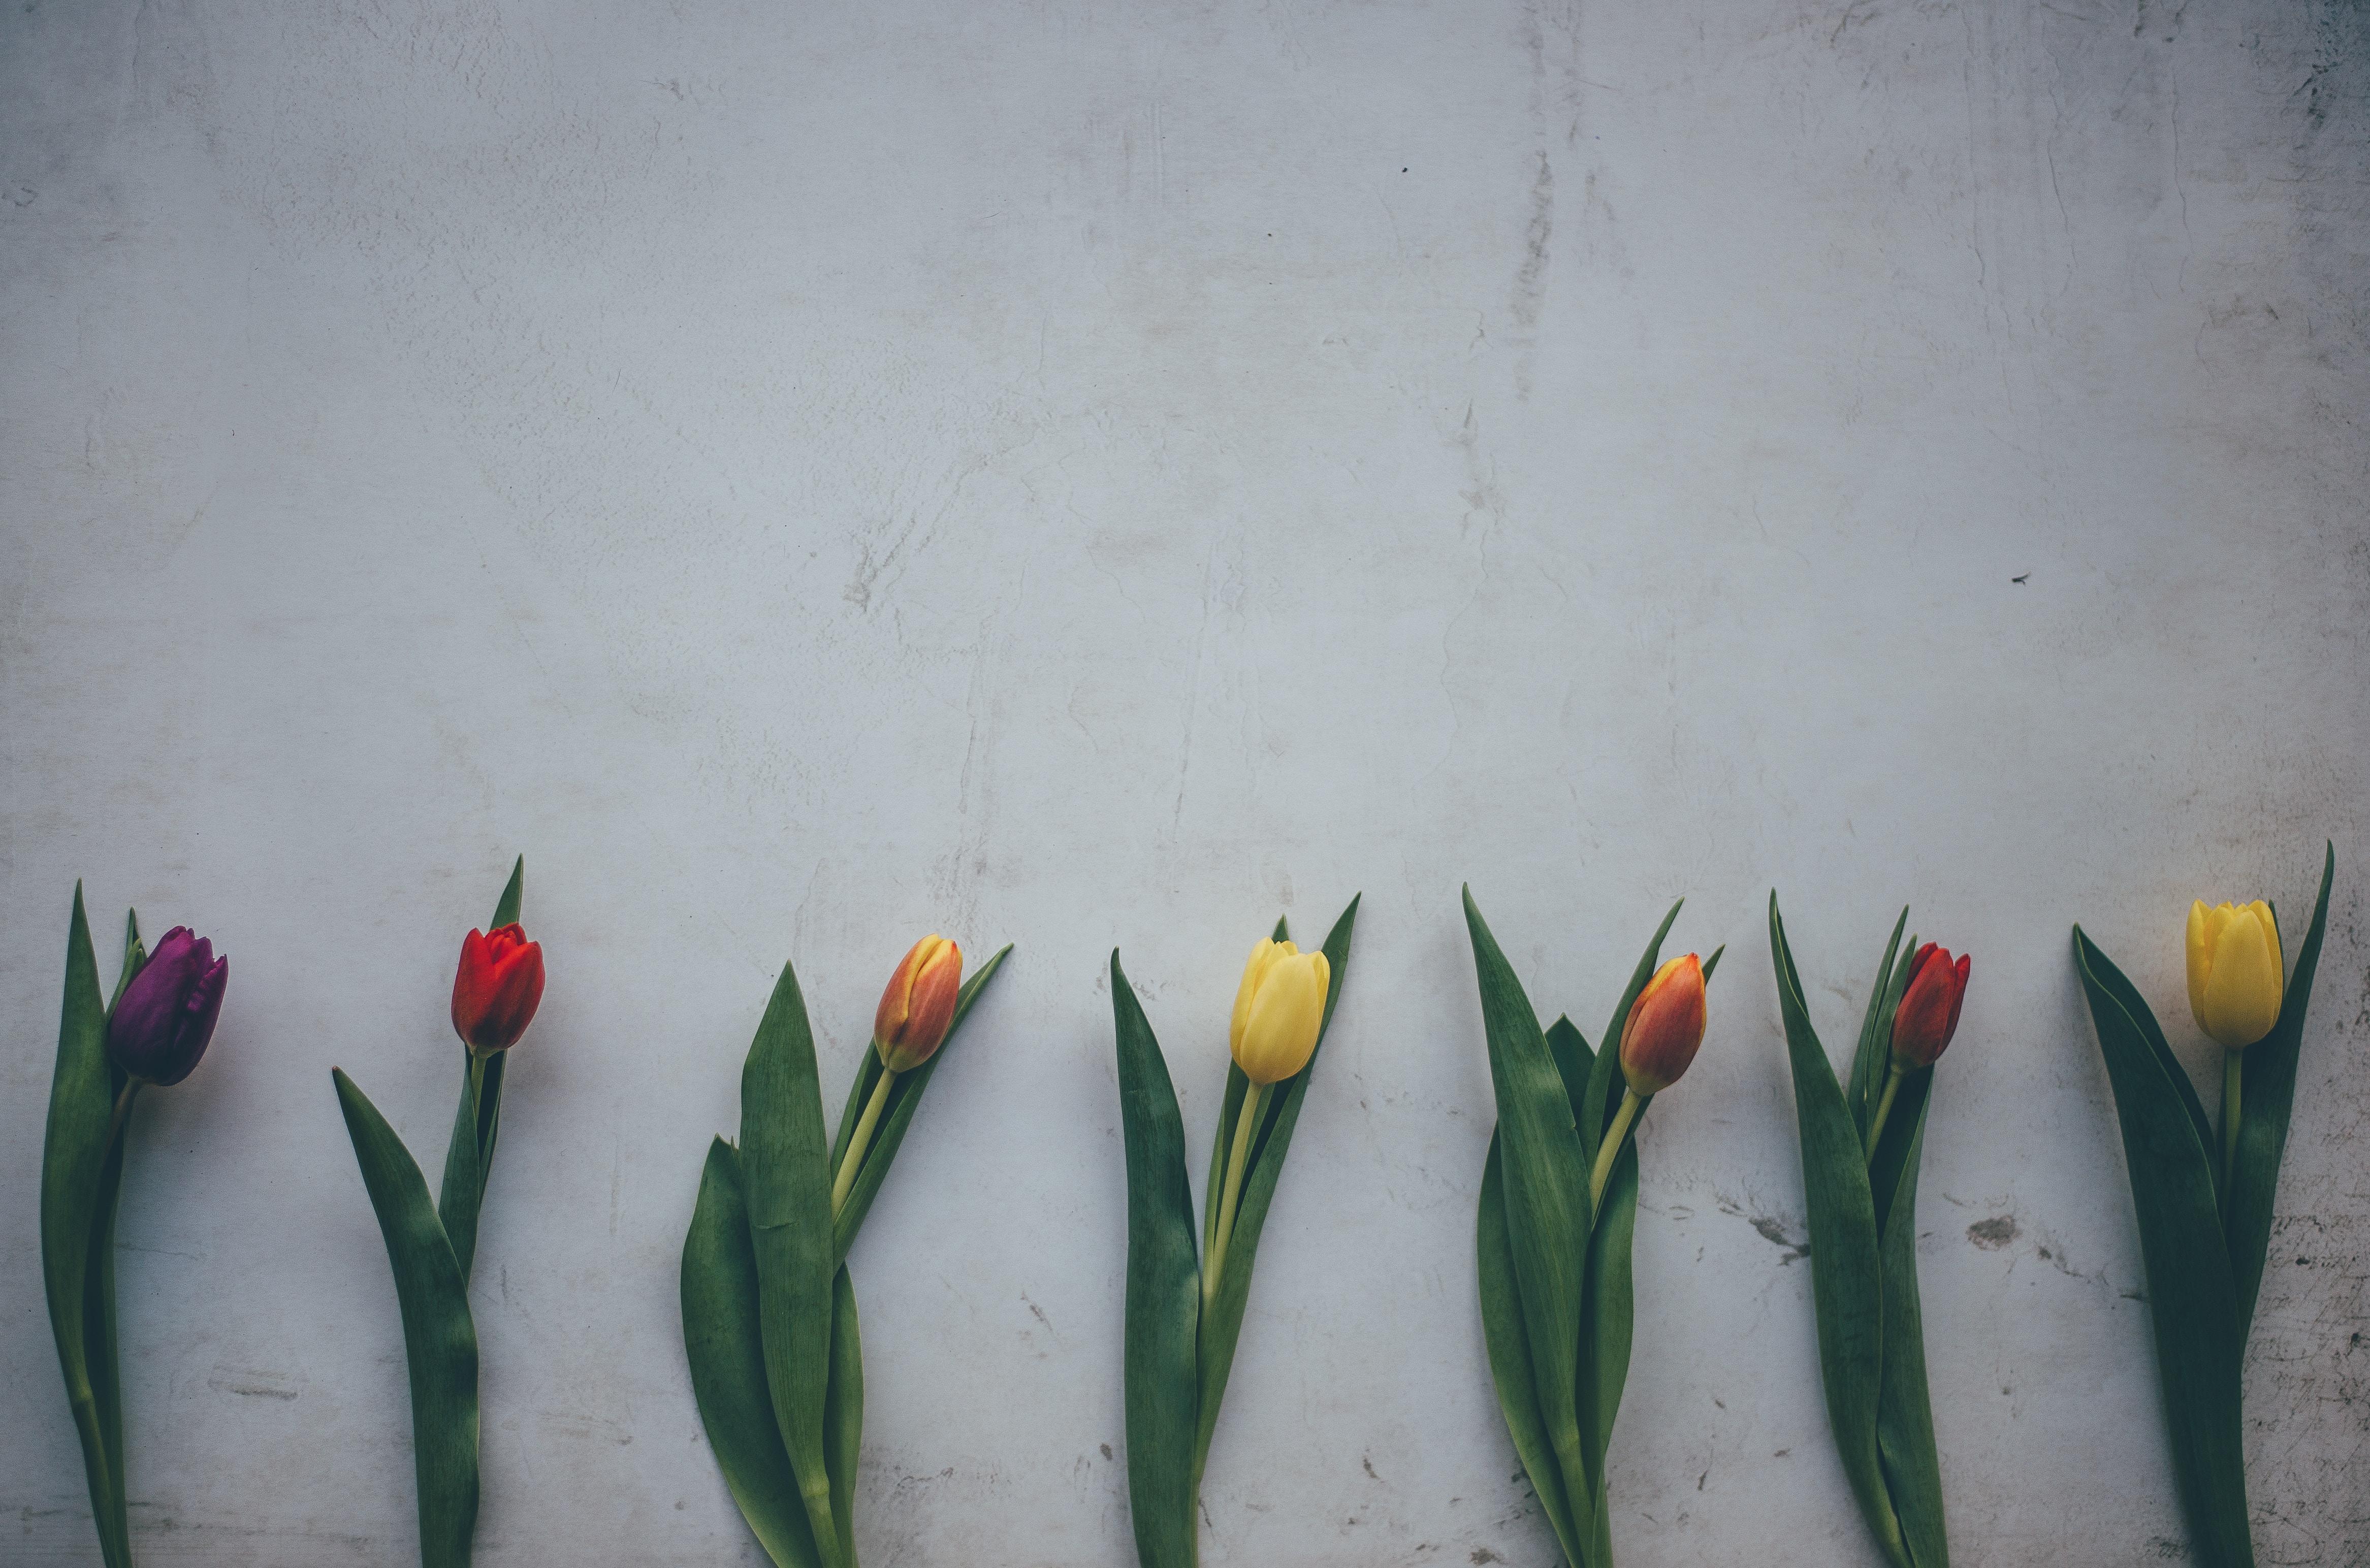 seven tulip flowers